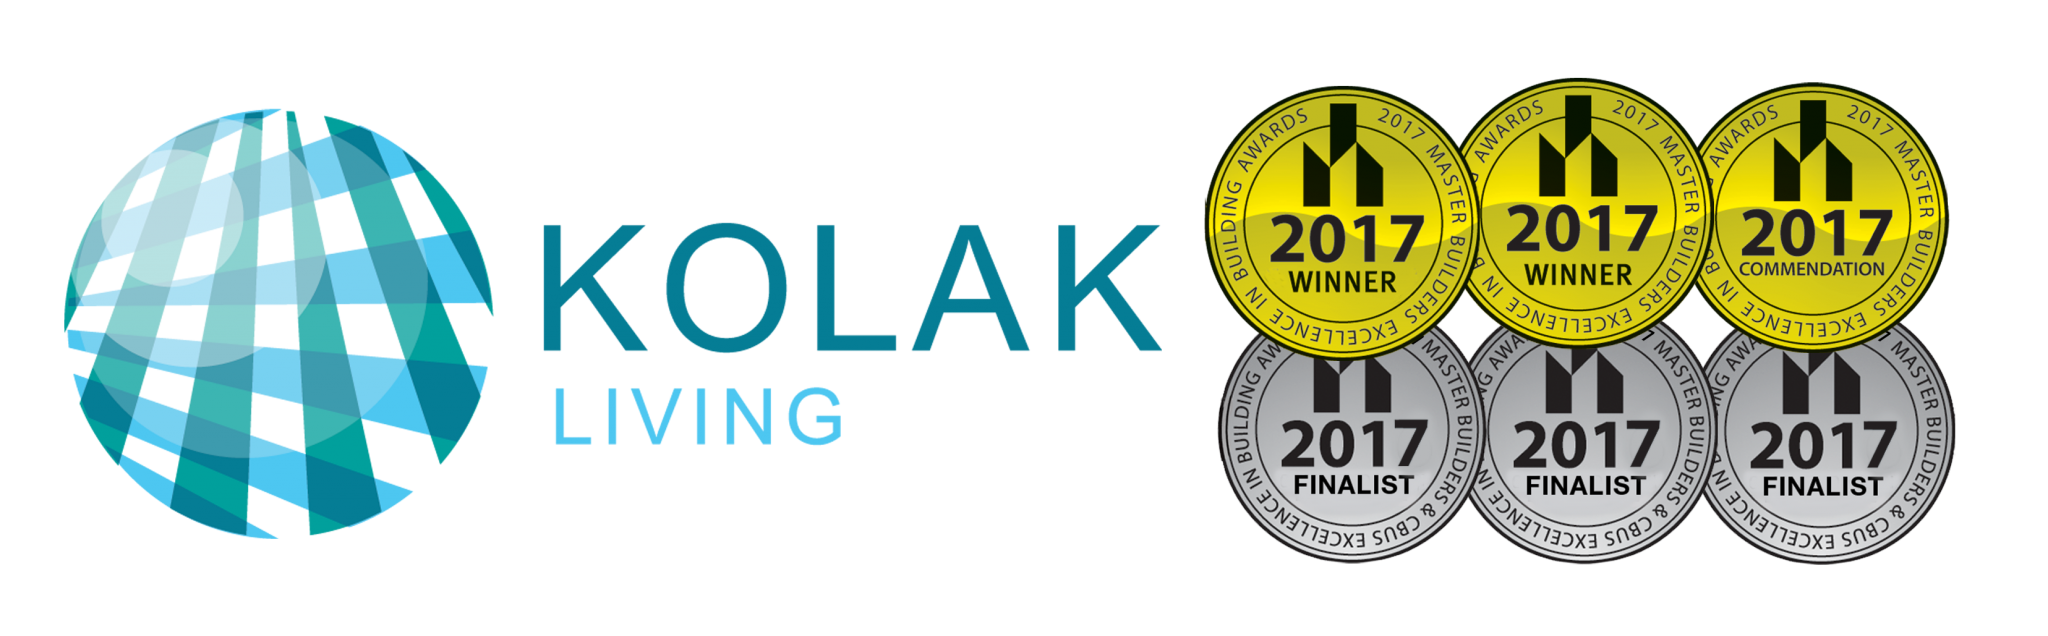 Kolak Living